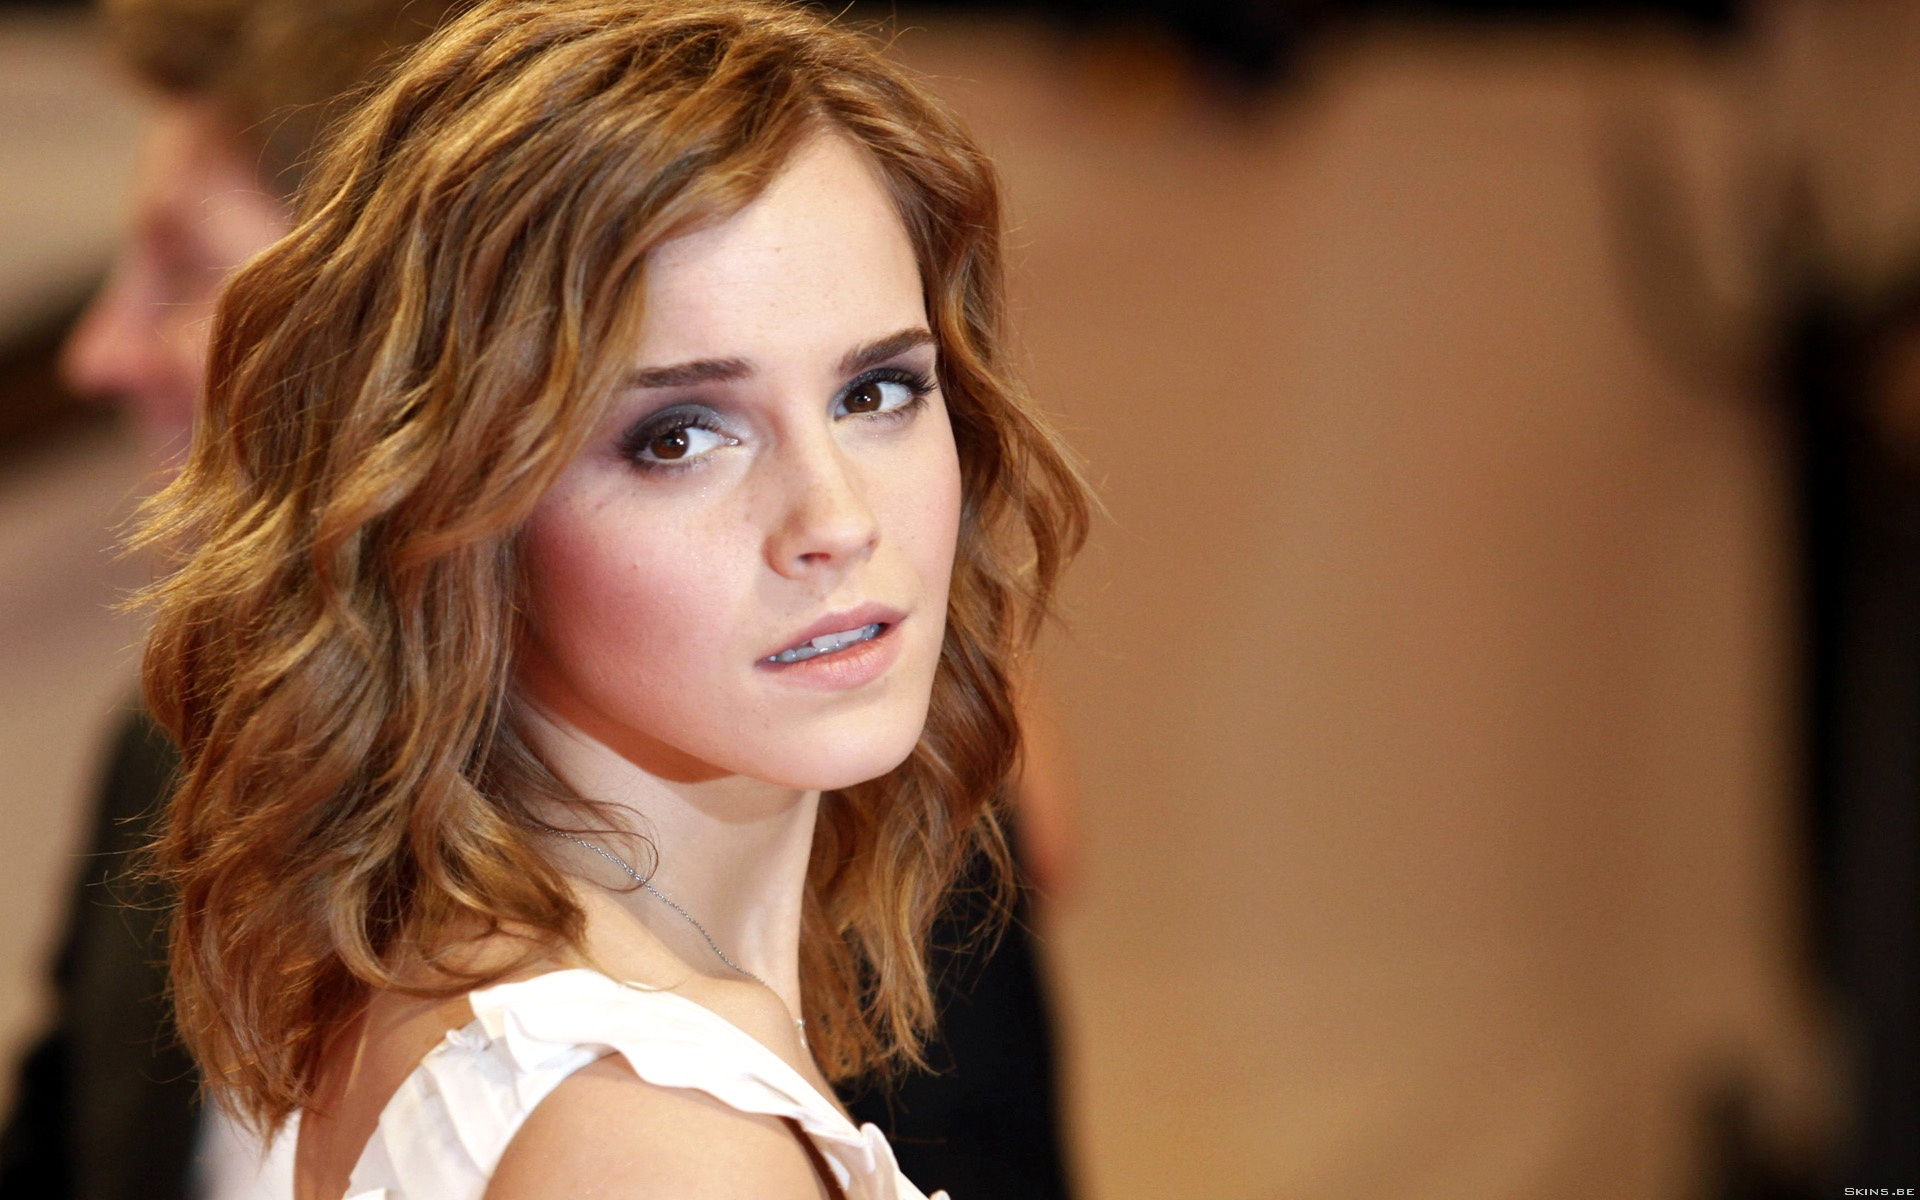 La bella Emma Watson - 1920x1200